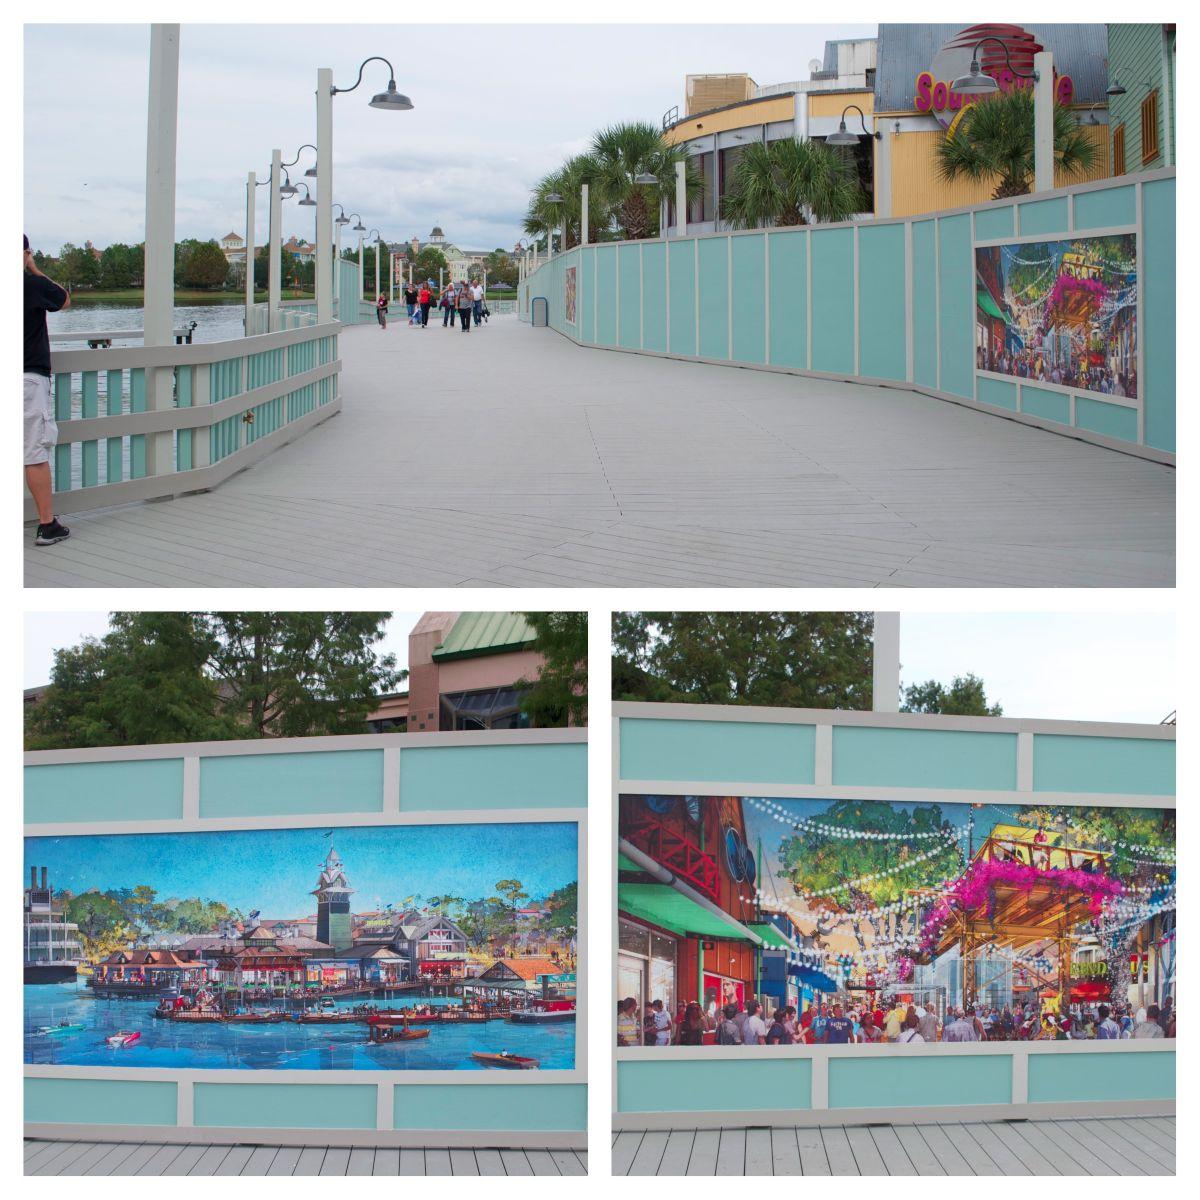 Pleasure Island bypass bridge collage